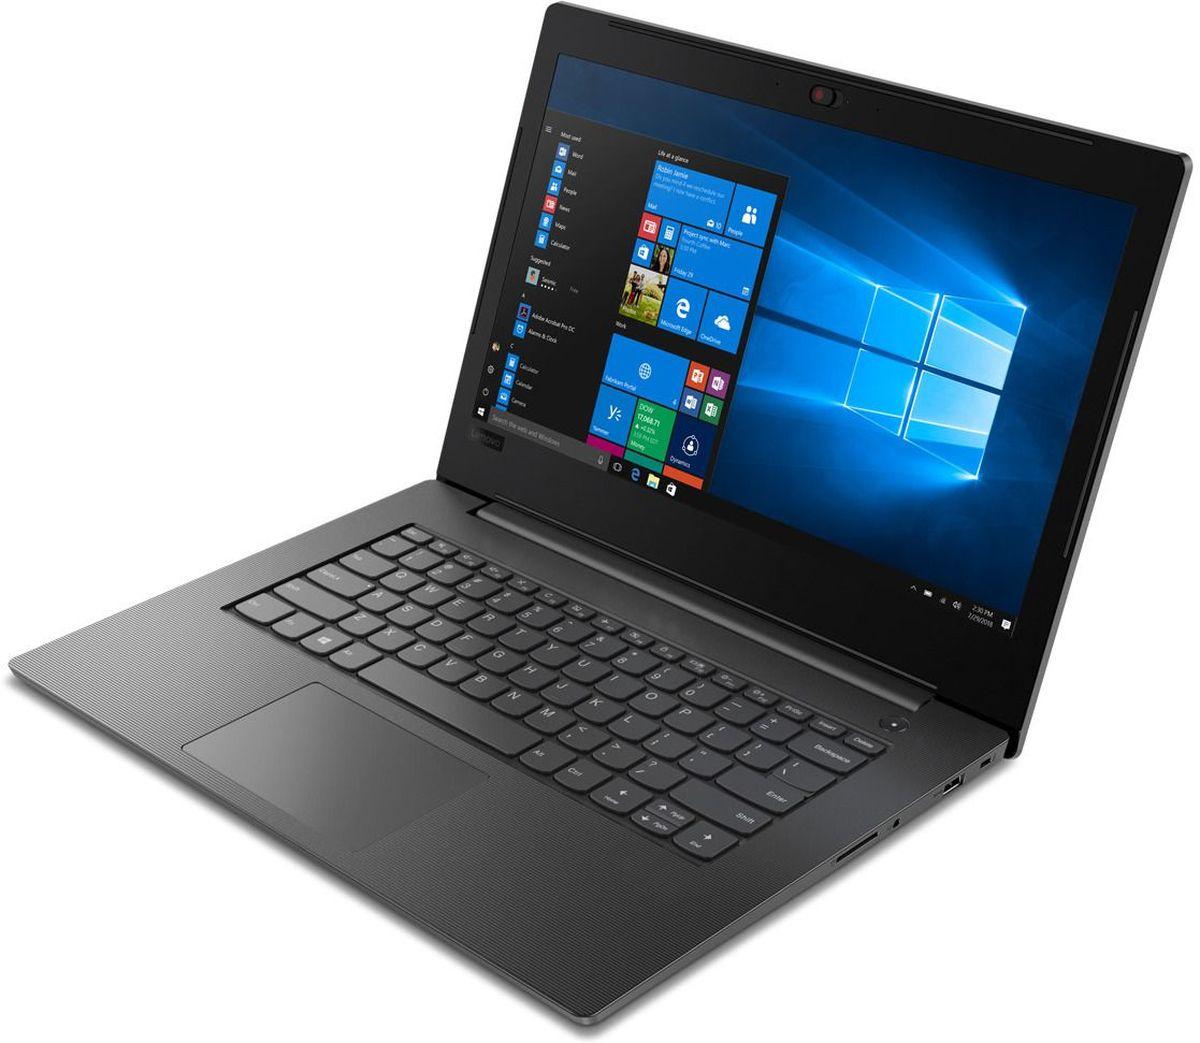 14 Ноутбук Lenovo V130-14 81HQ00EARU, серый ноутбук lenovo ideapad 320 15isk 80xh01cmrk выгодный набор серт 200р intel core i3 6006u 2 0 ghz 8192mb 1000gb intel hd graphics wi fi bluetooth cam 15 6 1920x1080 dos